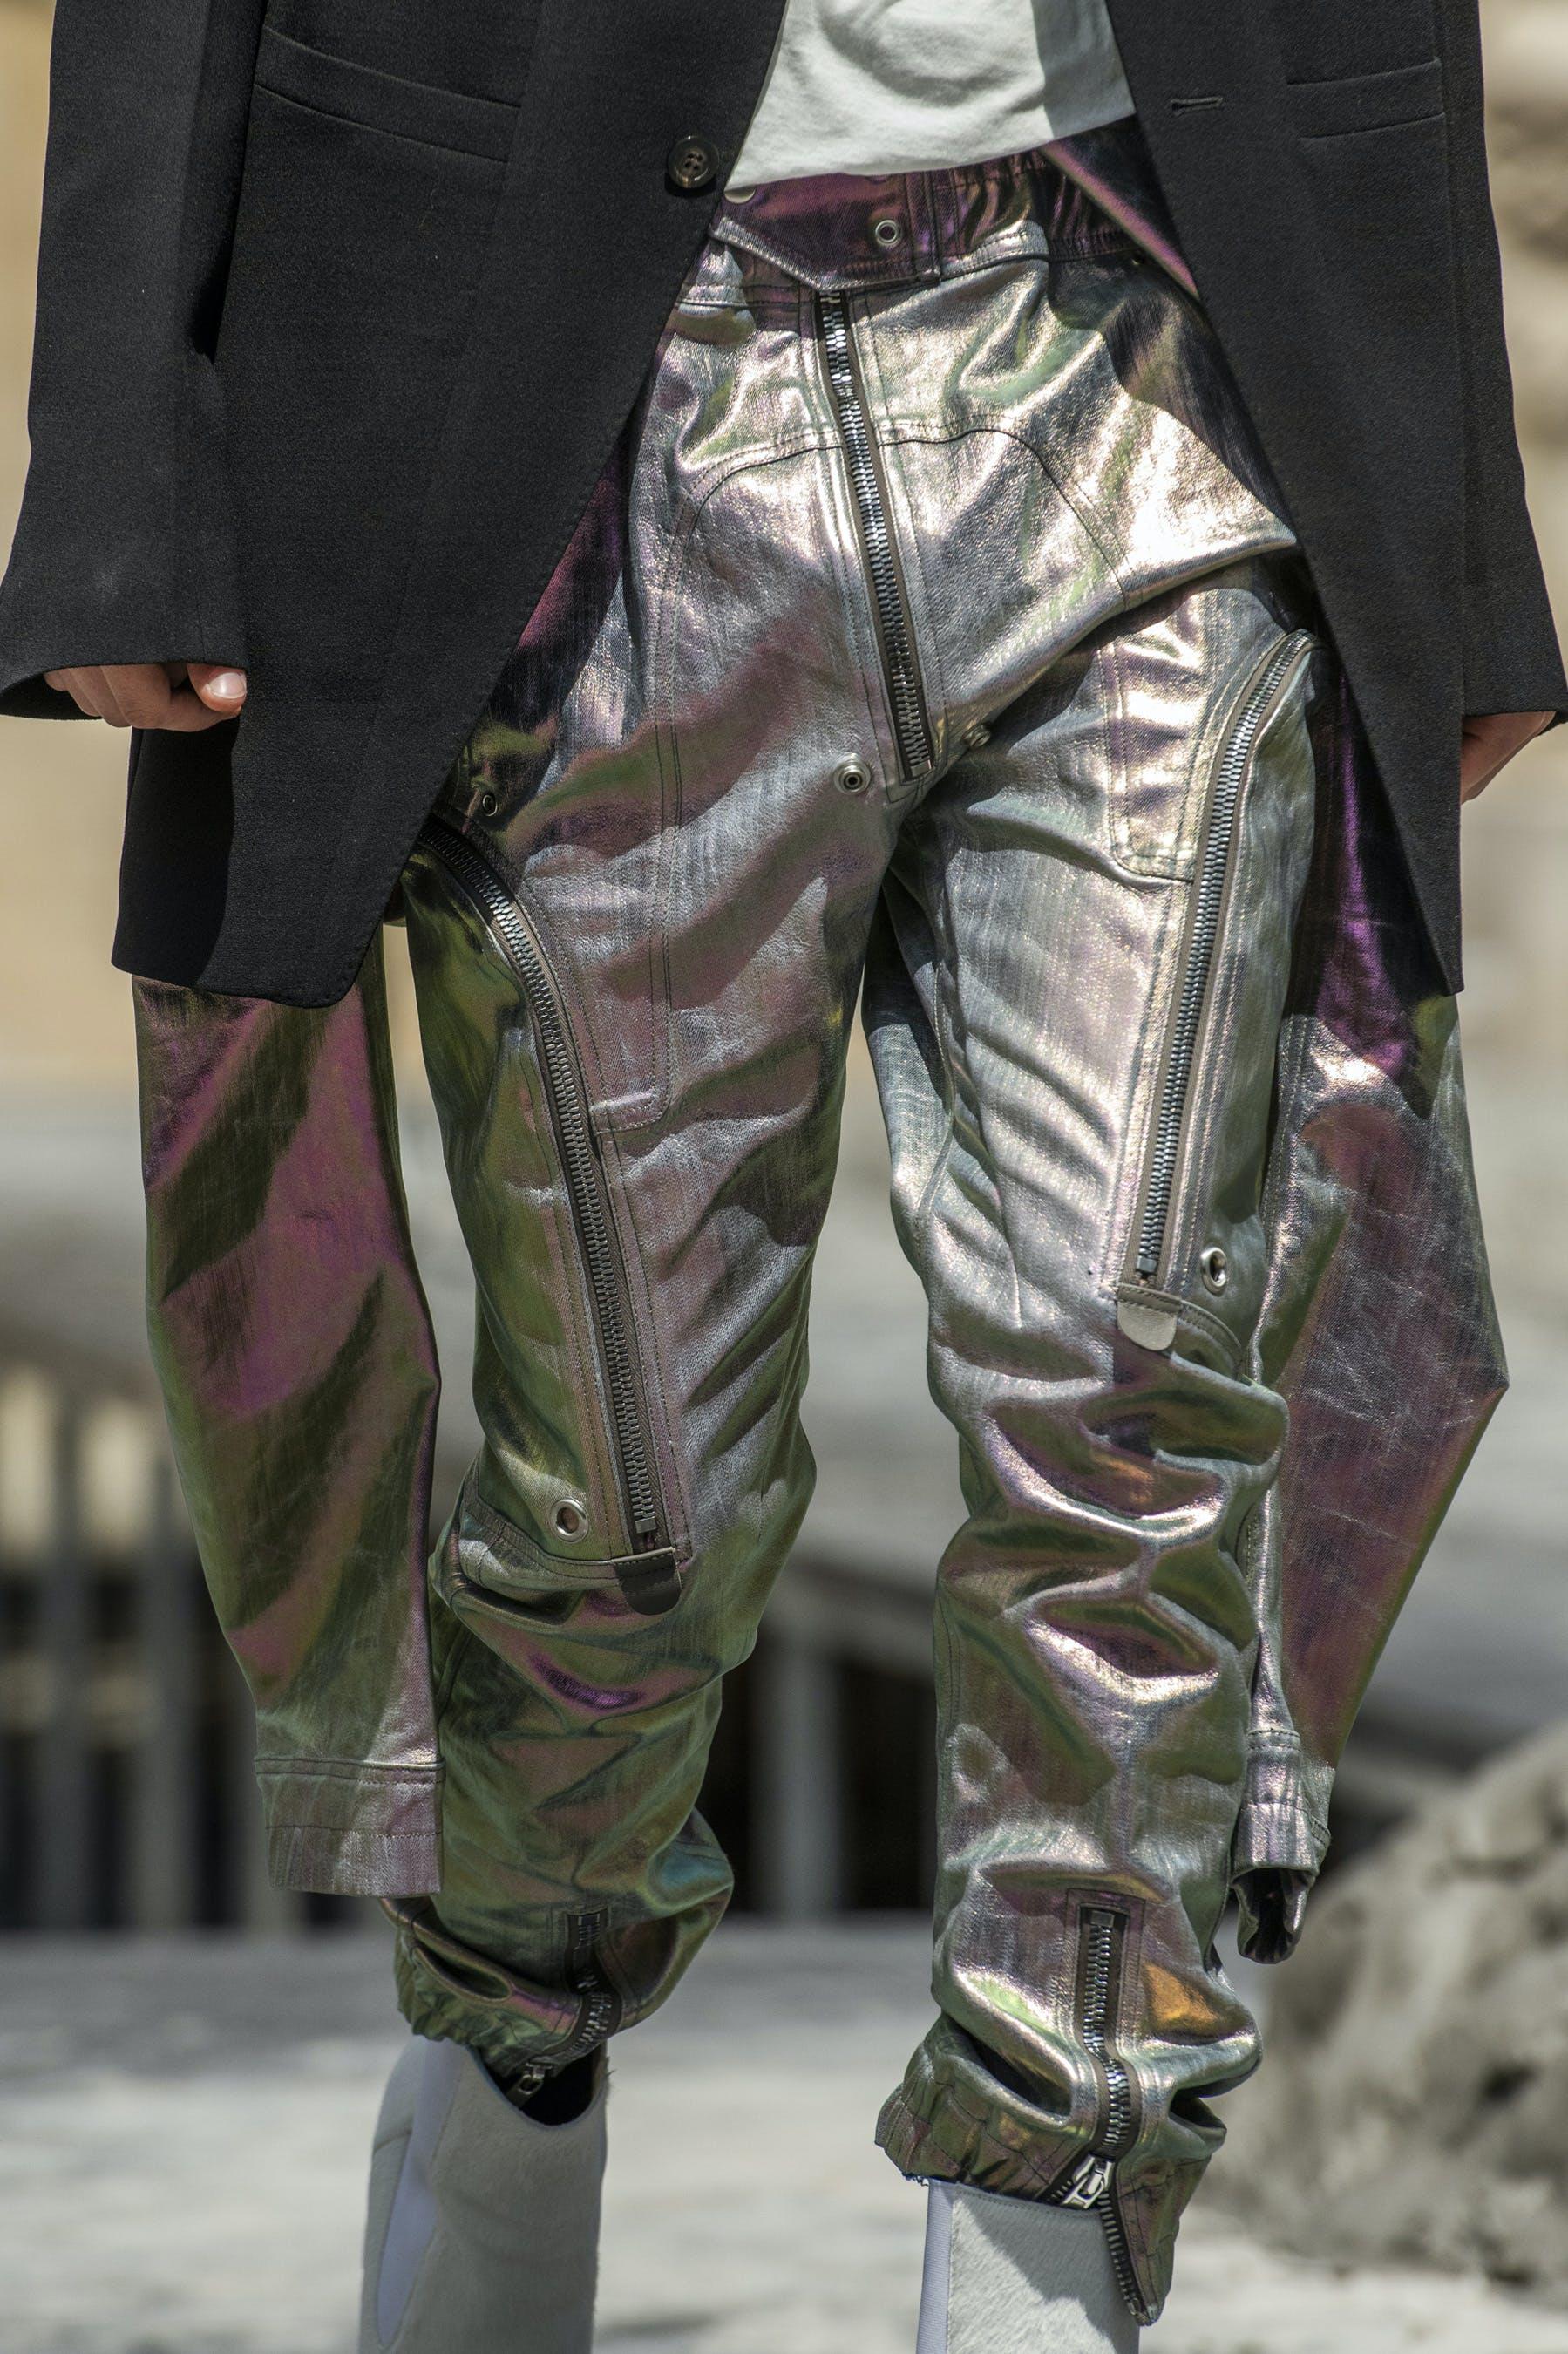 Rick Owens Runway Details Bauhaus Cargo Bodybag Jumpsuit in Iridescent Lemon Yellow Elastic Kiss Grill Boots In White With Transparent HeelMens SS20 Tecautl